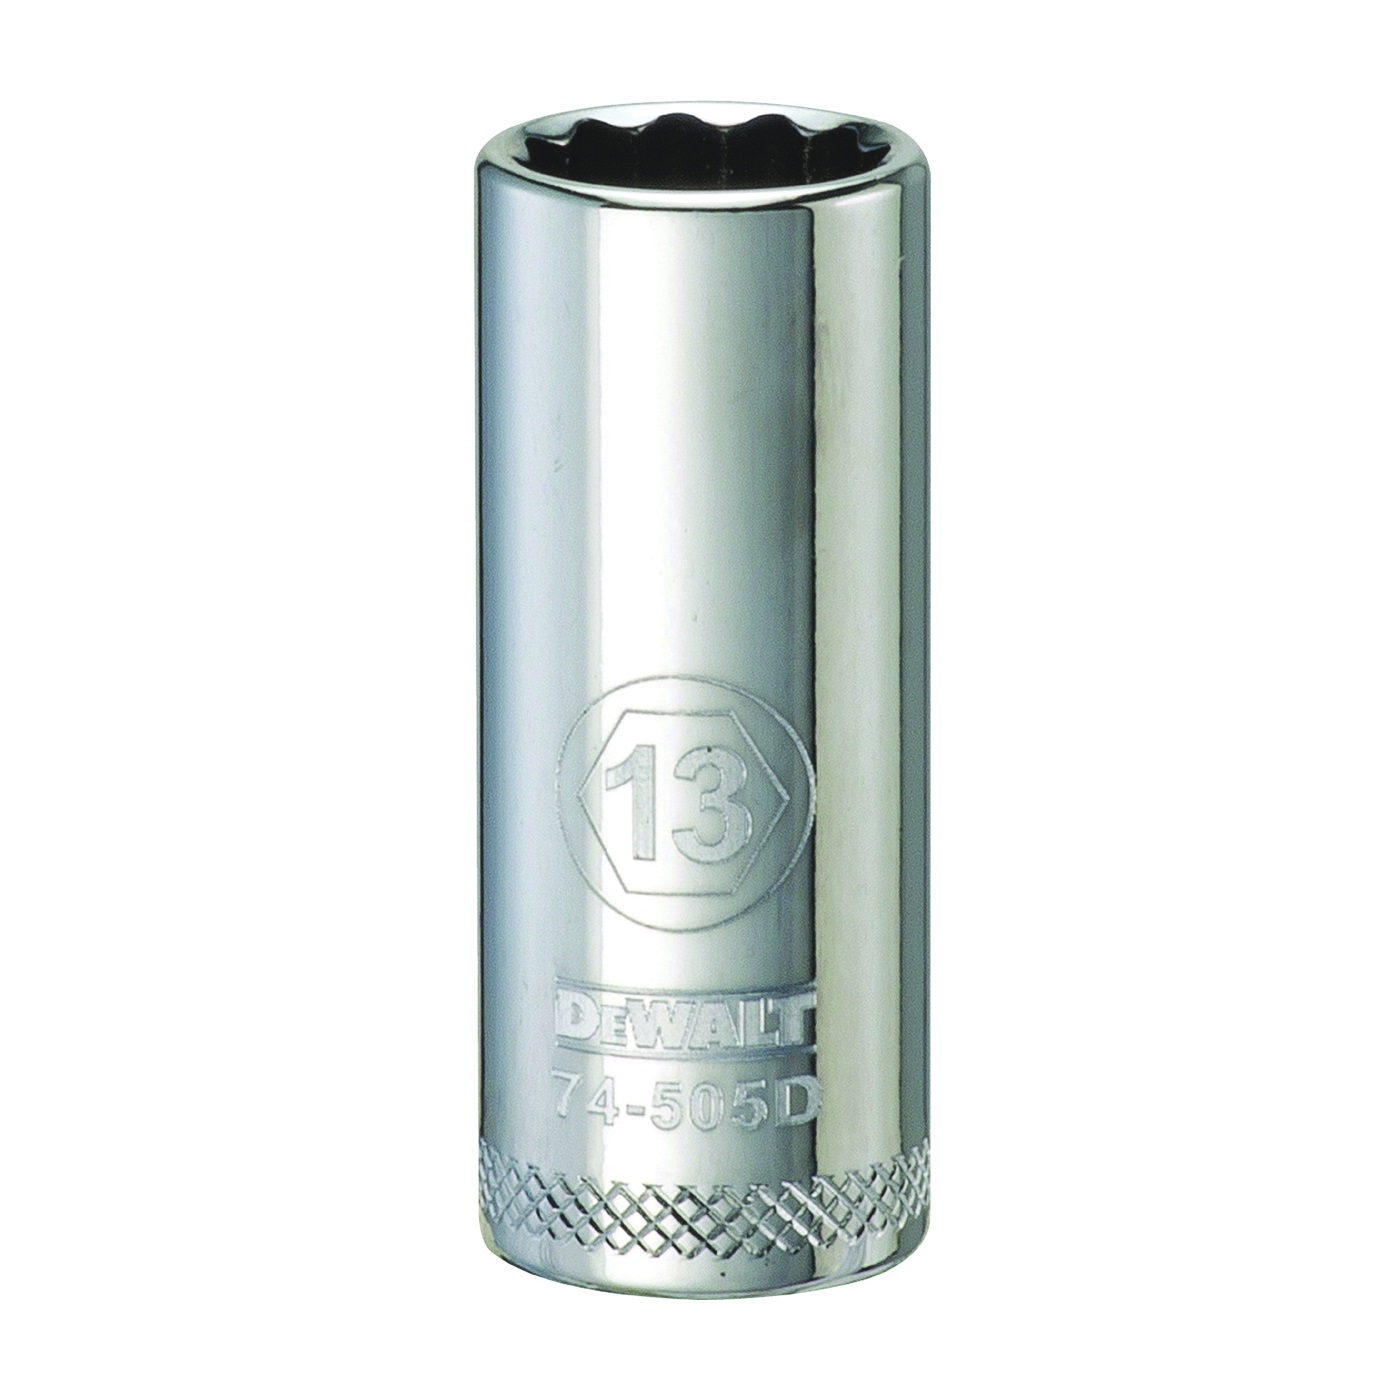 Picture of DeWALT DWMT74505OSP Drive Socket, 13 mm Socket, 3/8 in Drive, 12 -Point, Vanadium Steel, Polished Chrome